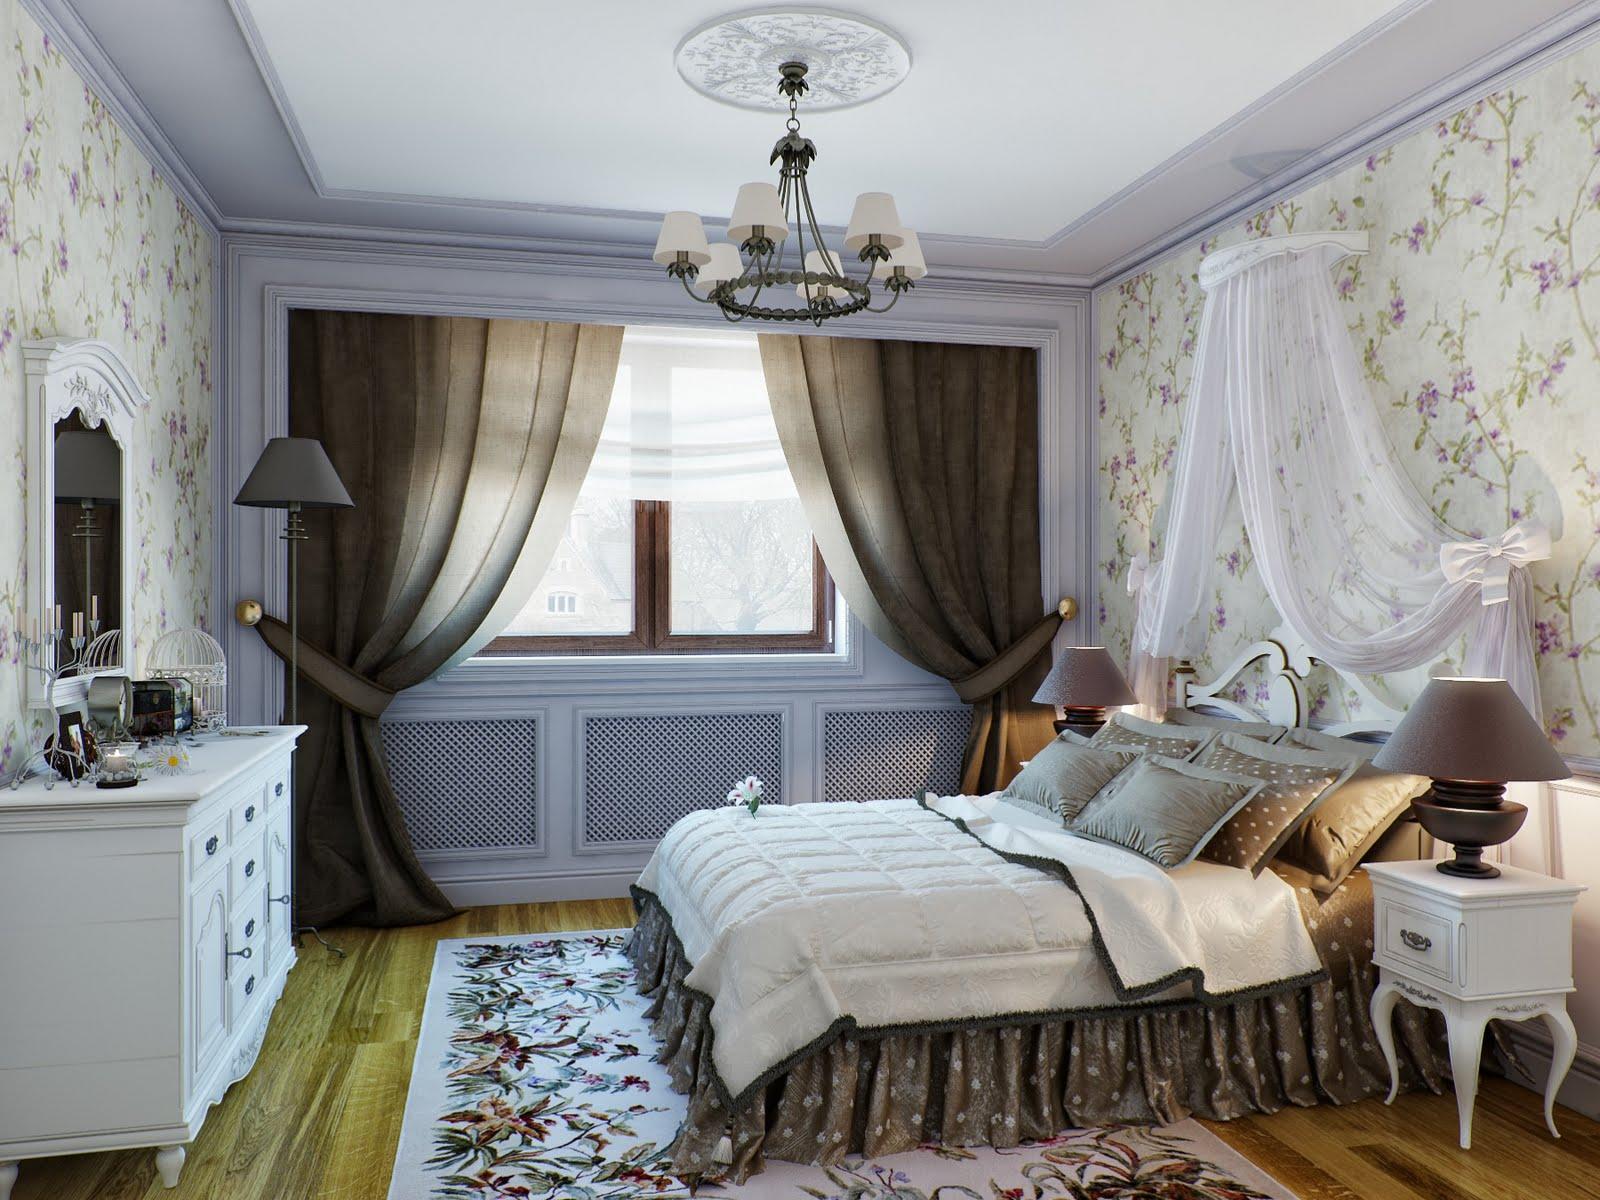 Спальня в стиле прованс своими руками фото